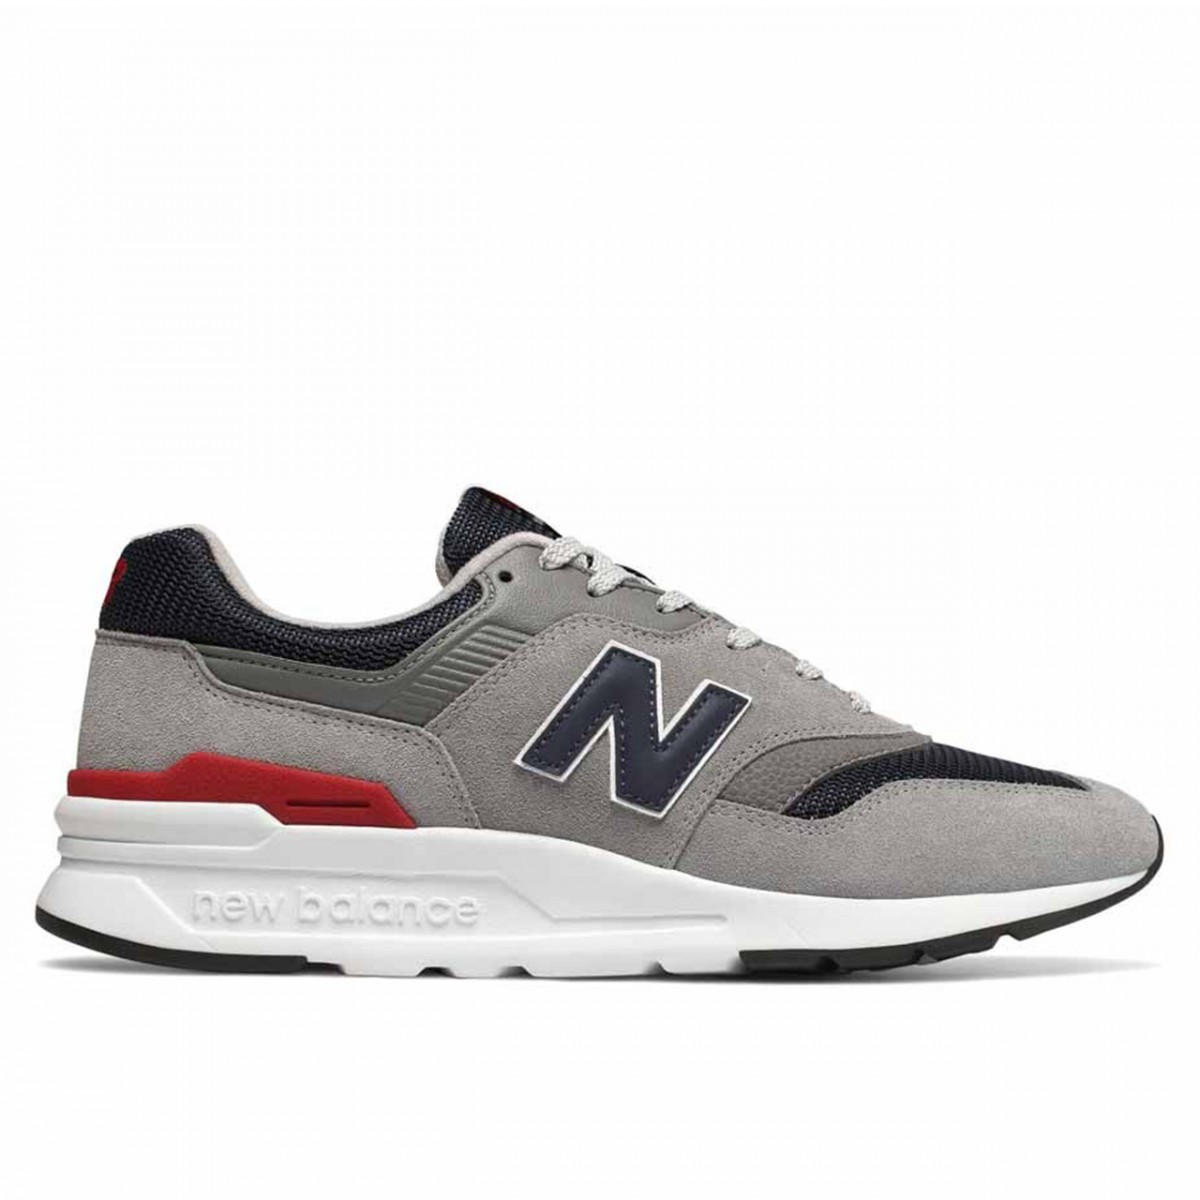 new balance uomo 997